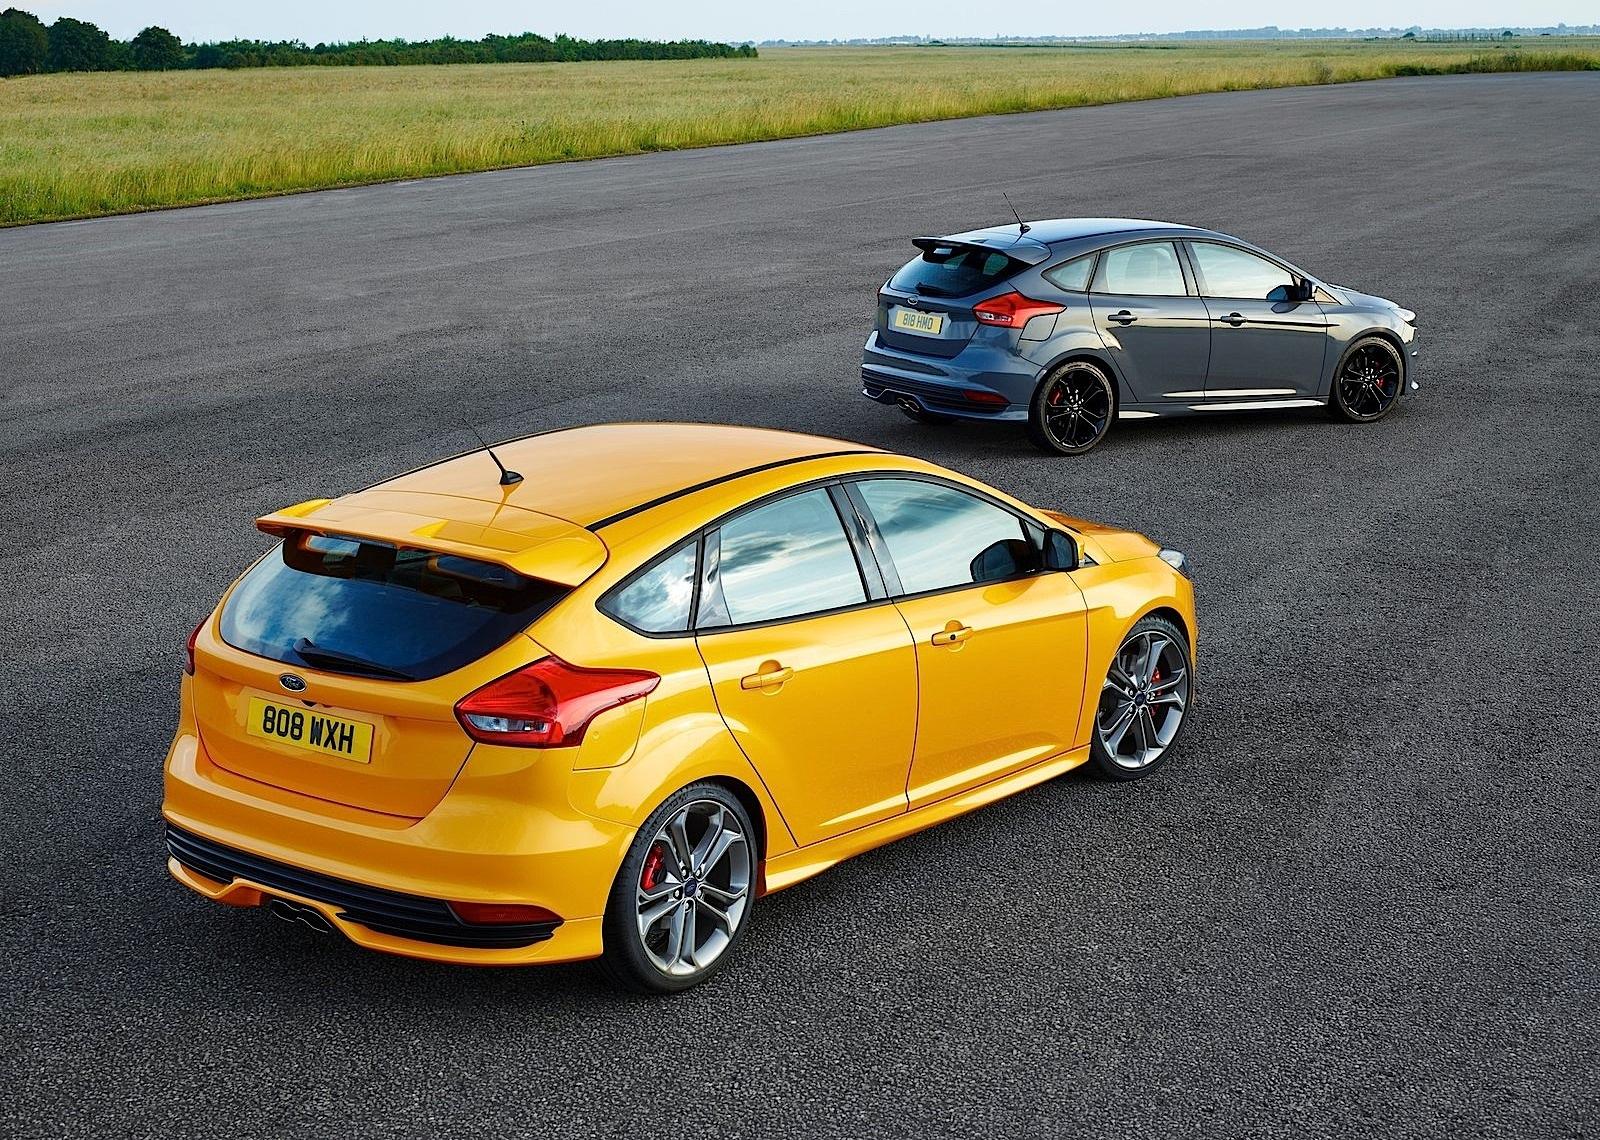 FORD Focus ST 5 Doors - 2014, 2015, 2016, 2017 - autoevolution